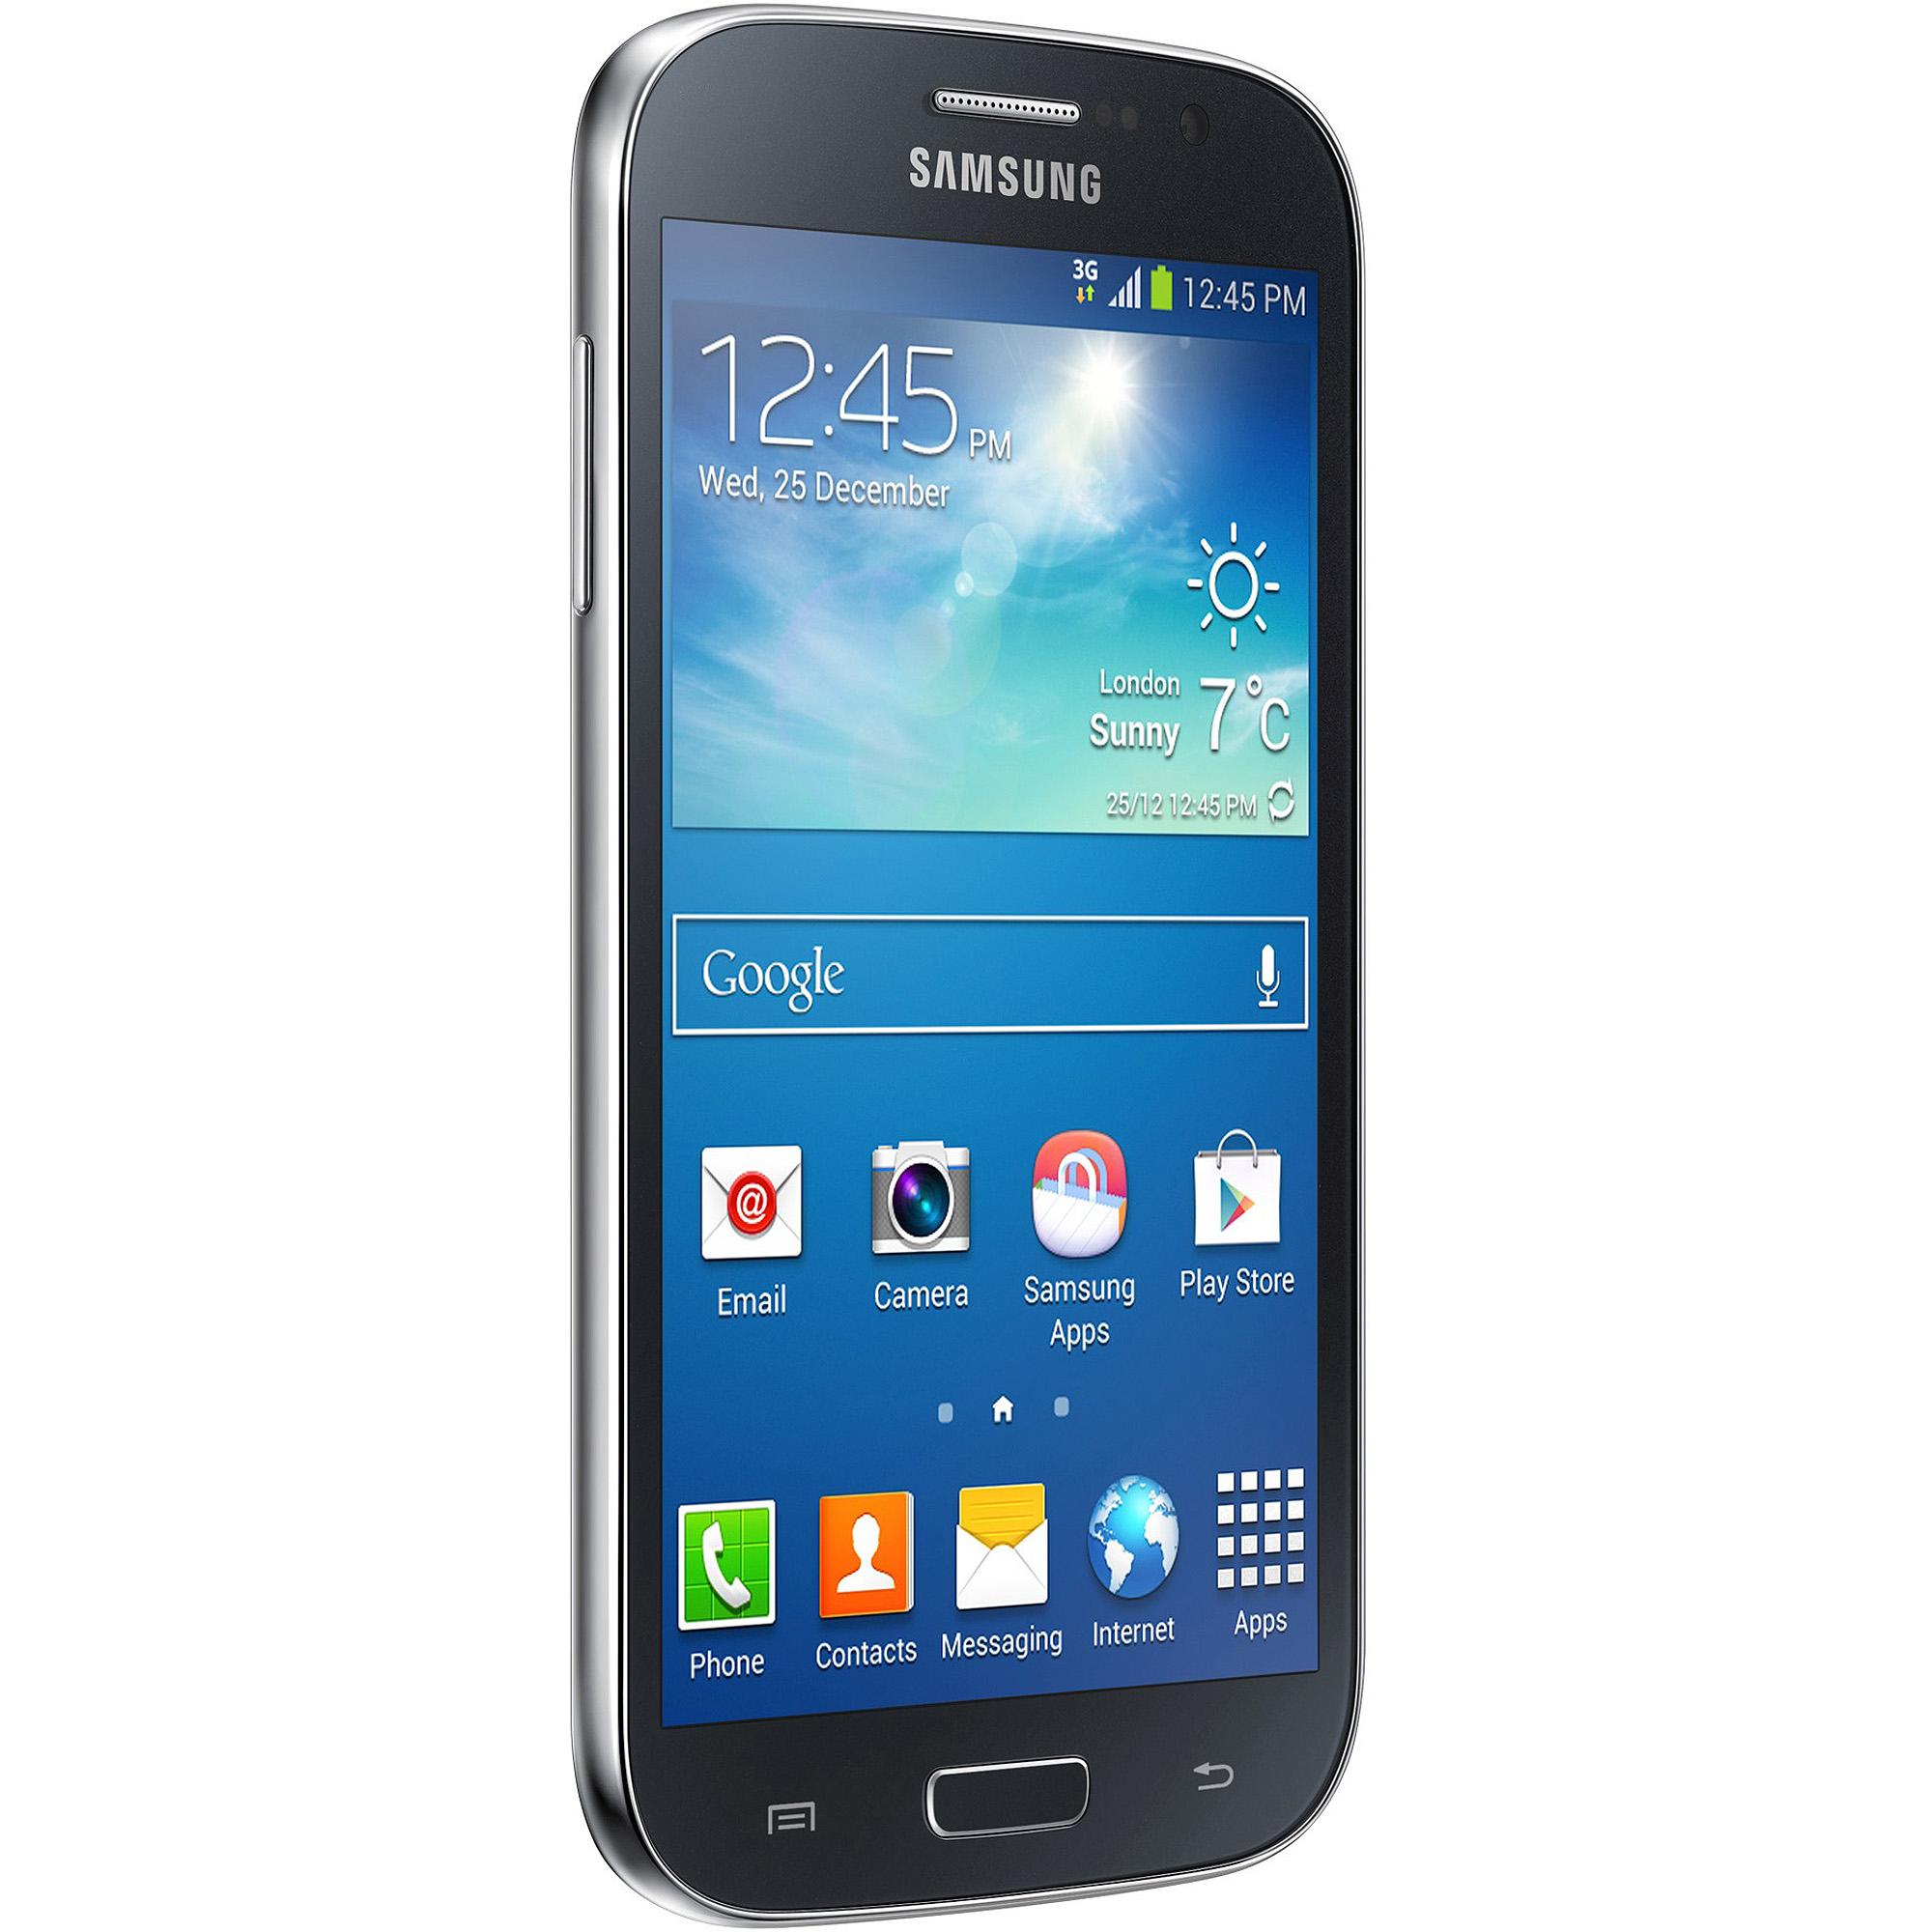 Samsung Korea Samsung Galaxy Grand Neo I9060 8 GB Factory Unlocked Cell Phones - Black